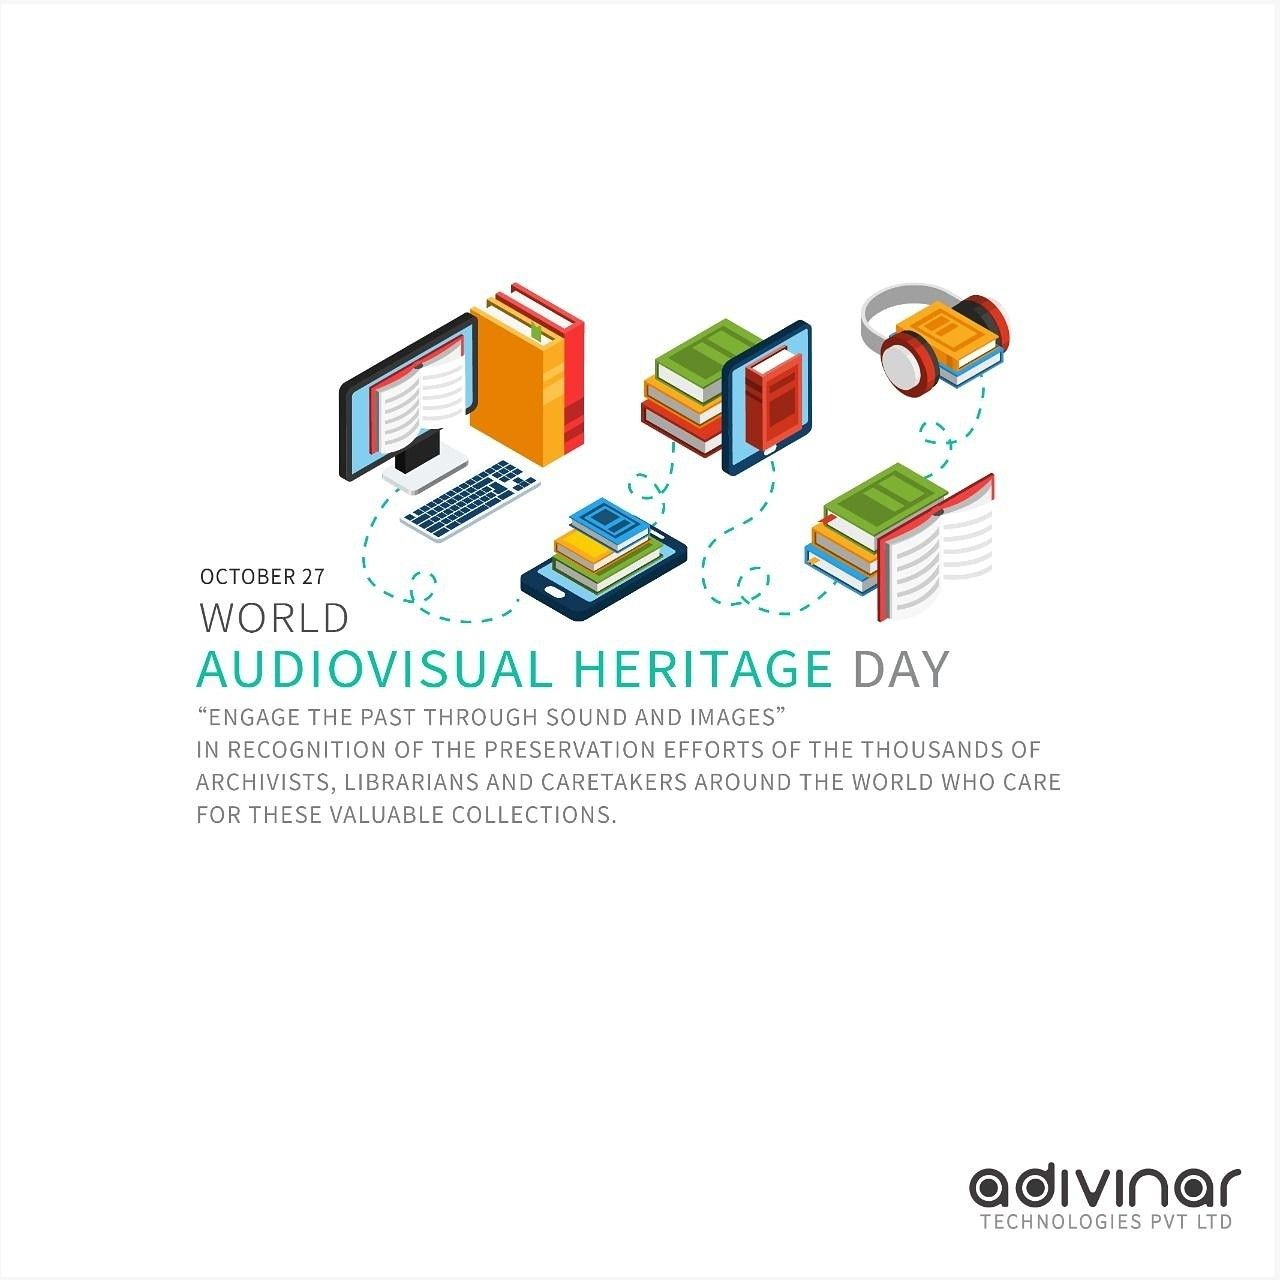 World Audiovisual Heritage Day Thiruvanathapuram Kerala Technologies Adivinar Adivinartec Ad Audi Heritage Technology